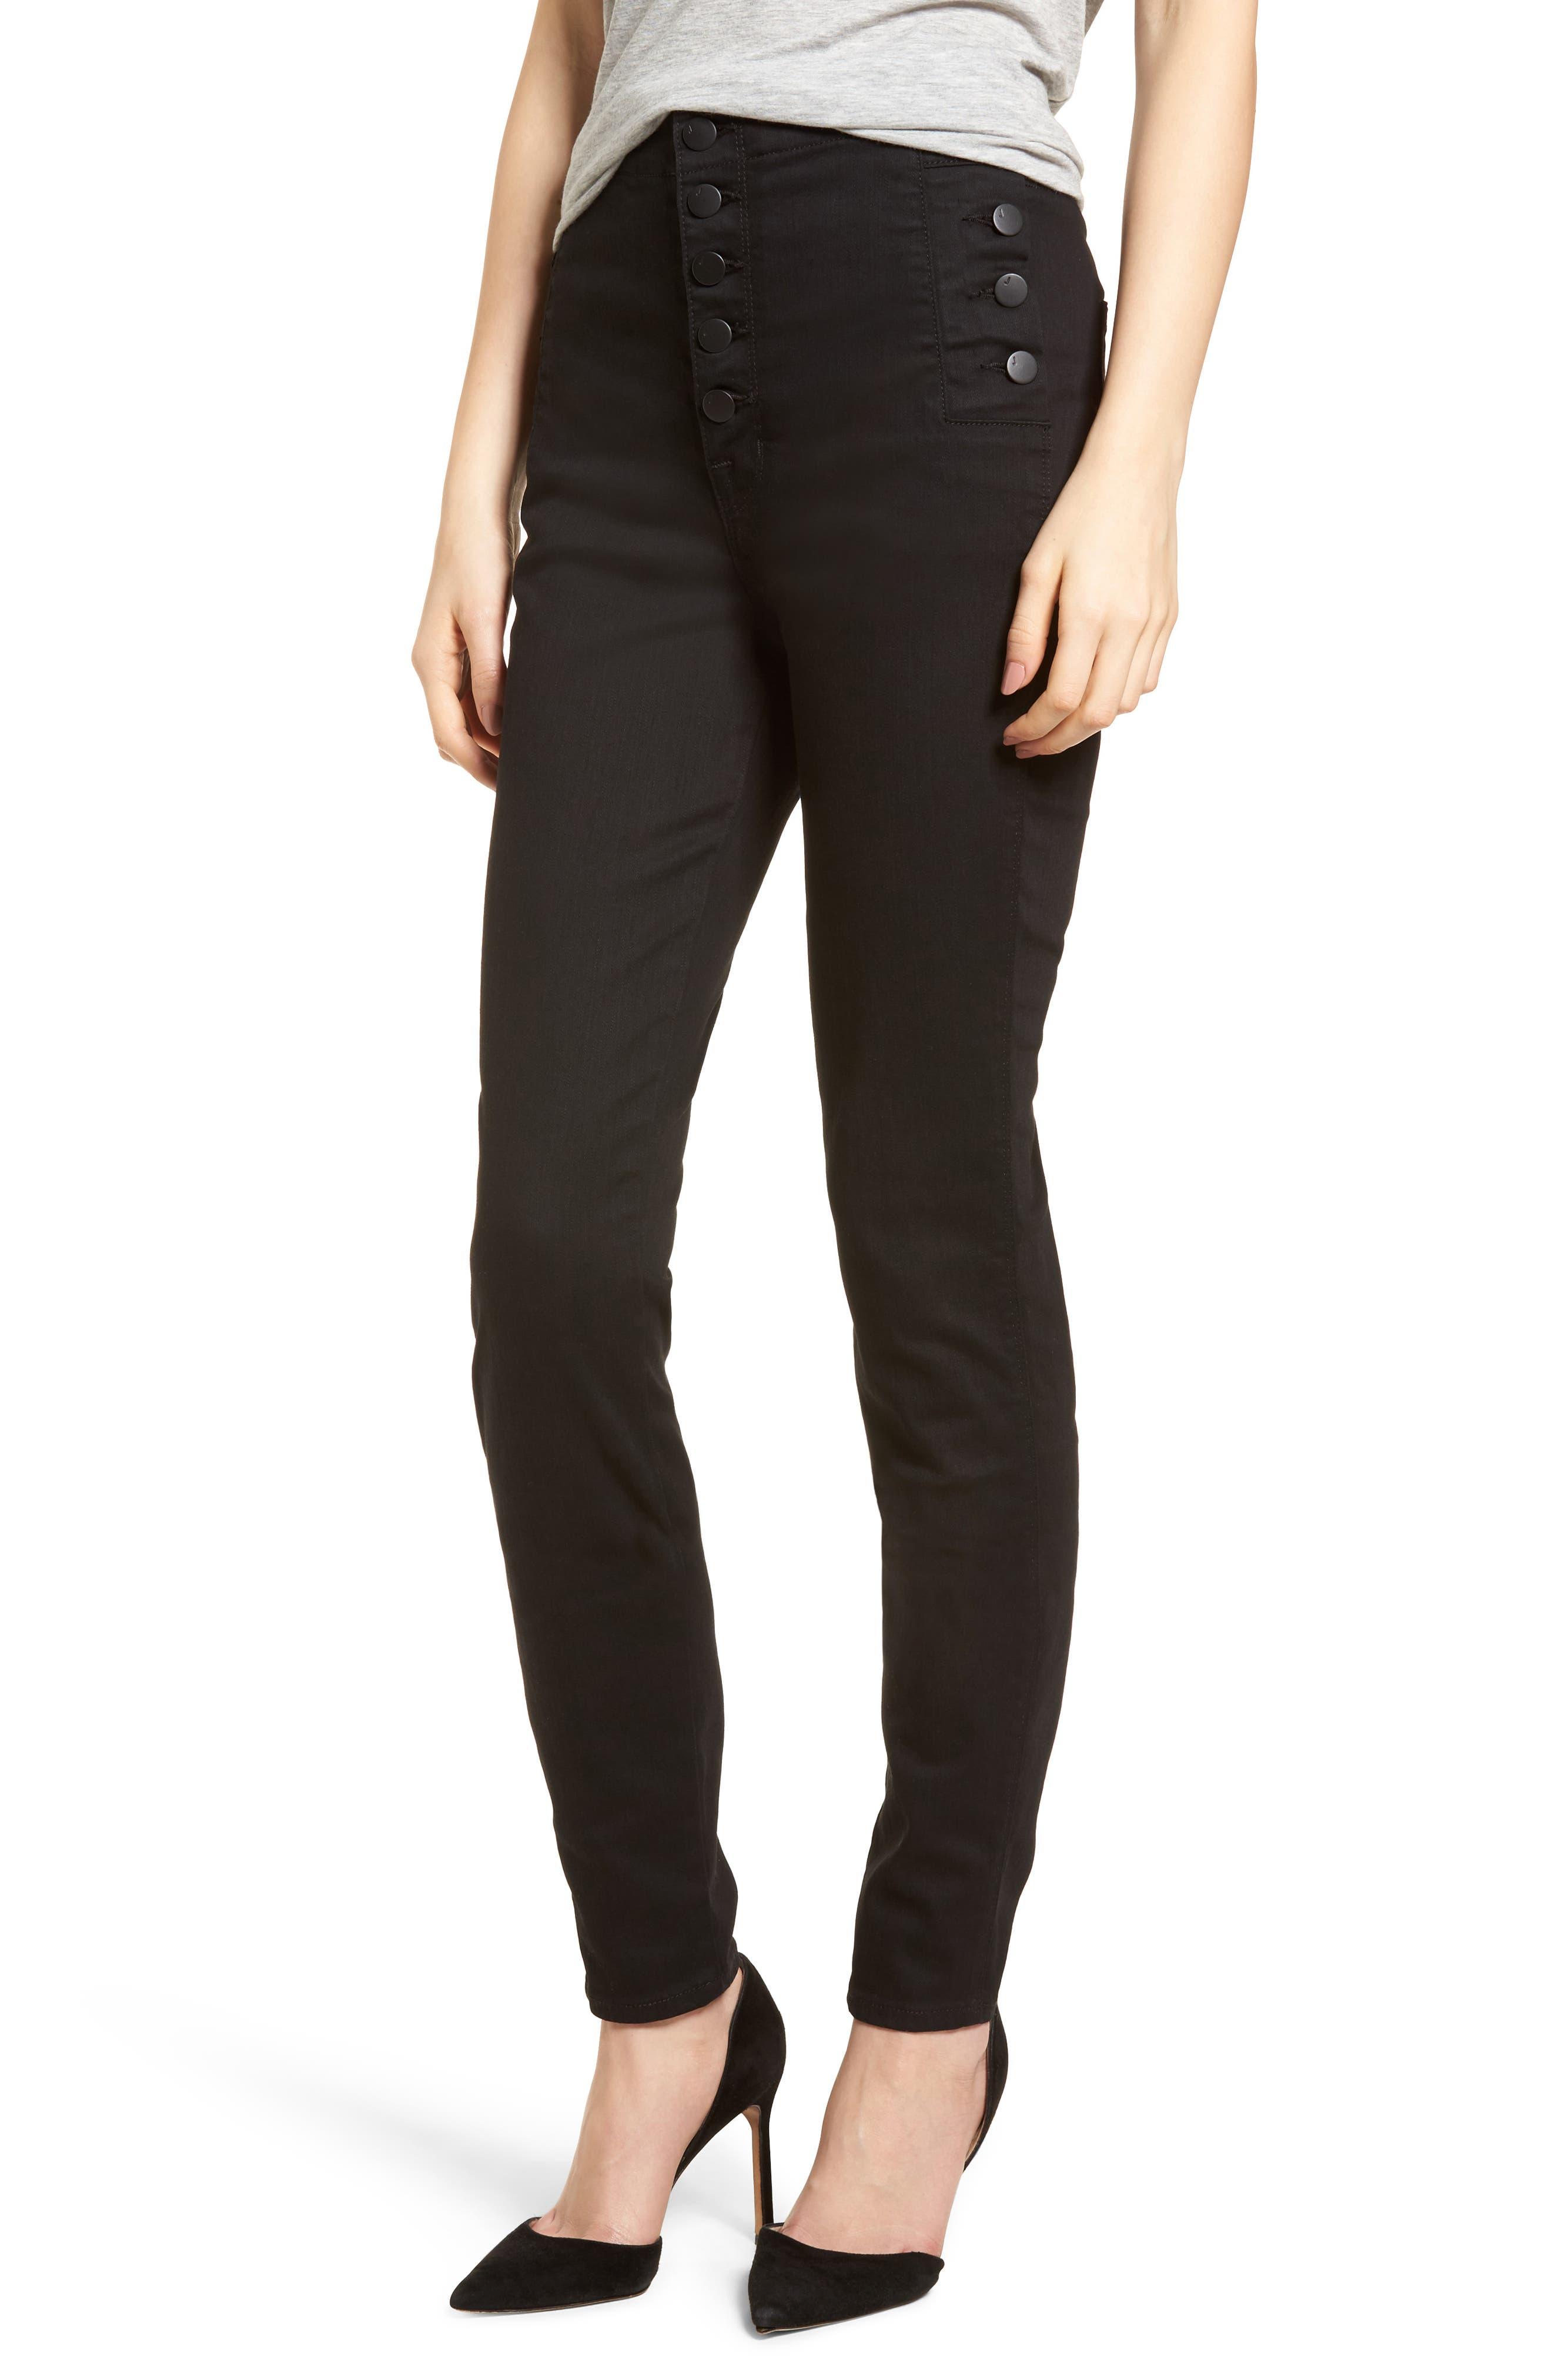 J Brand Natasha High Waist Skinny Jeans (Vanity) (Nordstrom Exclusive)